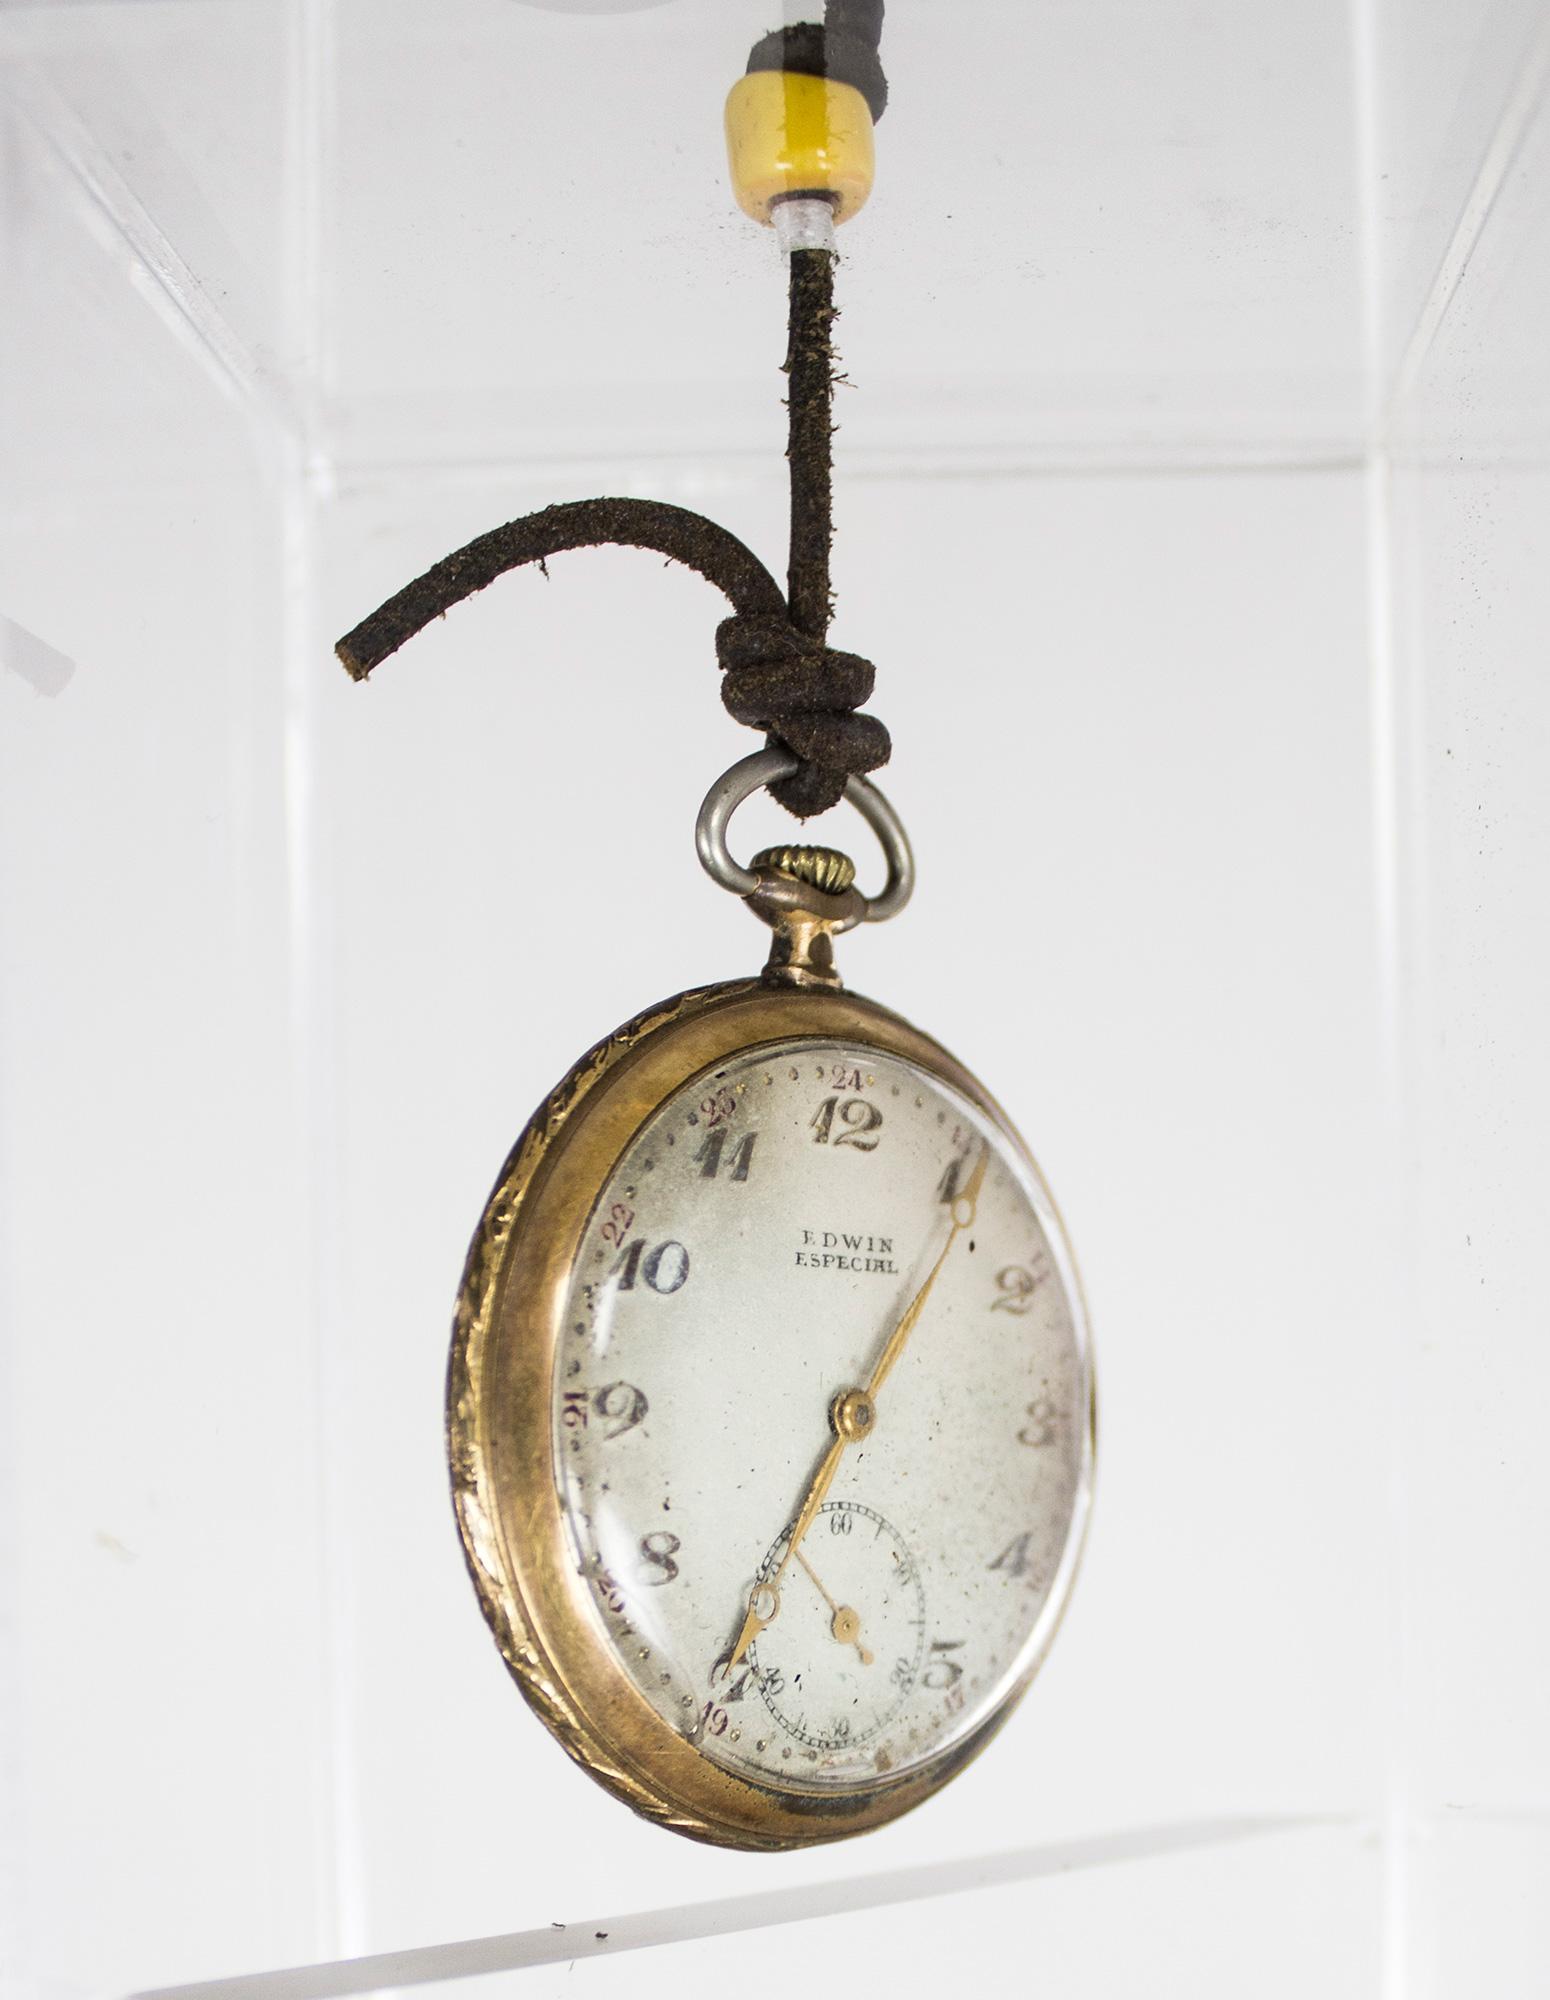 """Time"" - Sculpture, Metal base, burned wood, Watches, Acrylic Box - 4""x4""x67-1/2"" - © Flavio Bisciotti"